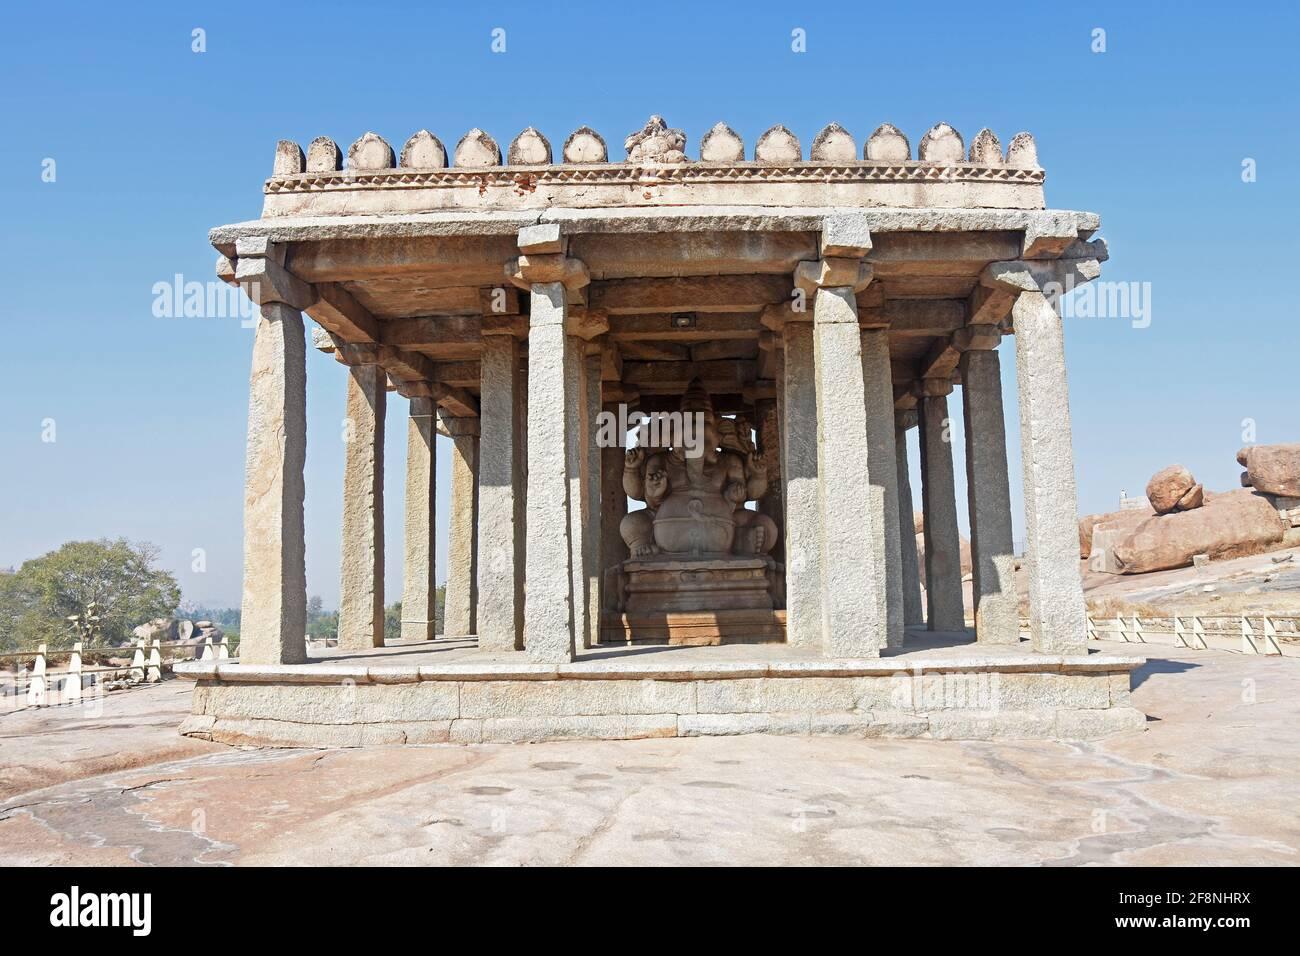 Sasivekalu Ganesha statue, Ancient architecture from the 14th century Vijayanagara empire at Hampi is a UNESCO World Heritage site Stock Photo